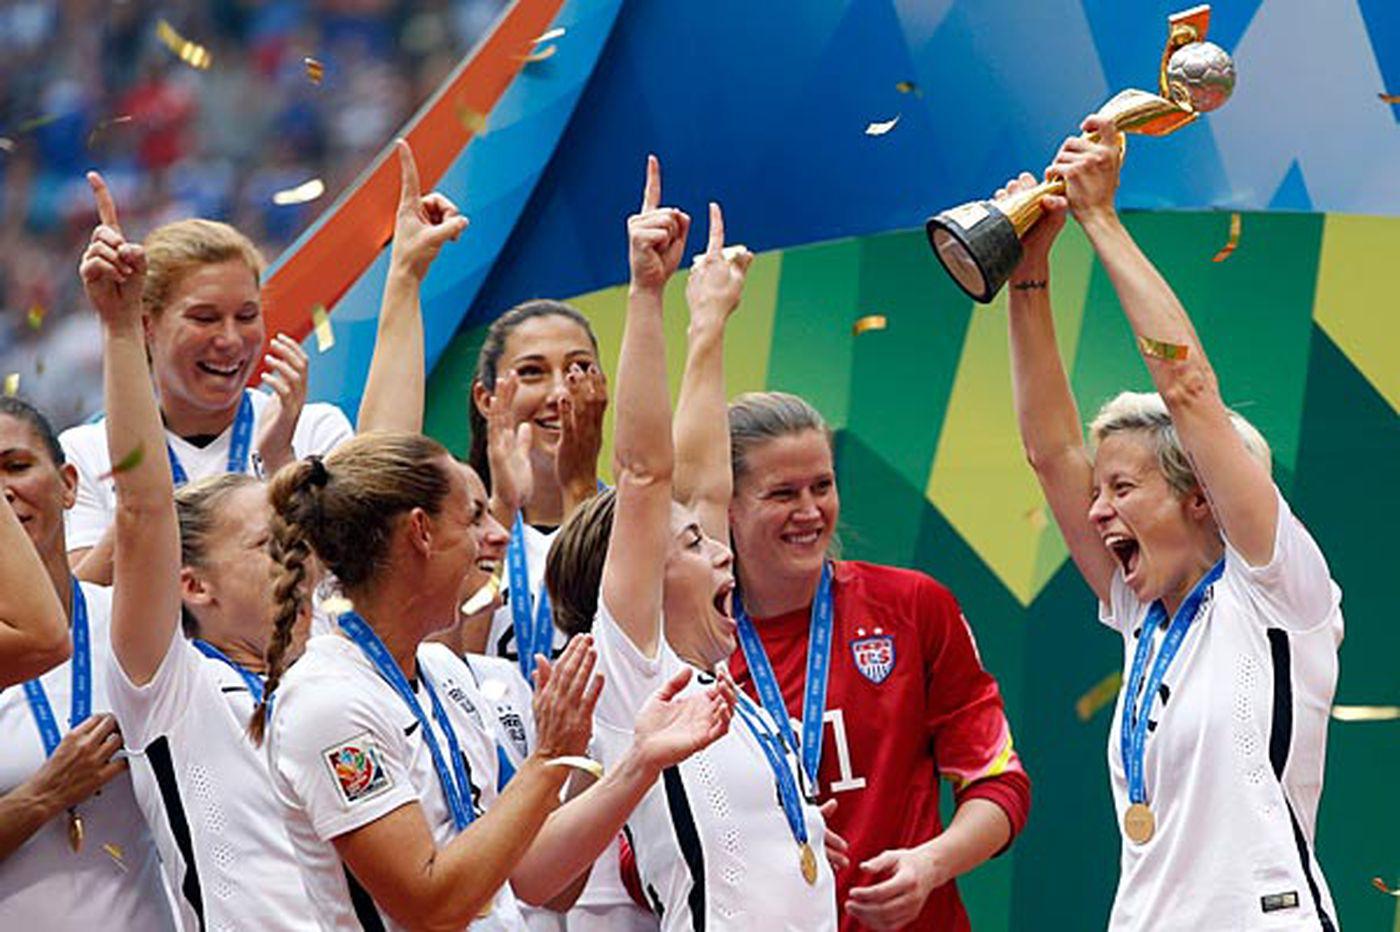 U.S. women storm past Japan and capture World Cup